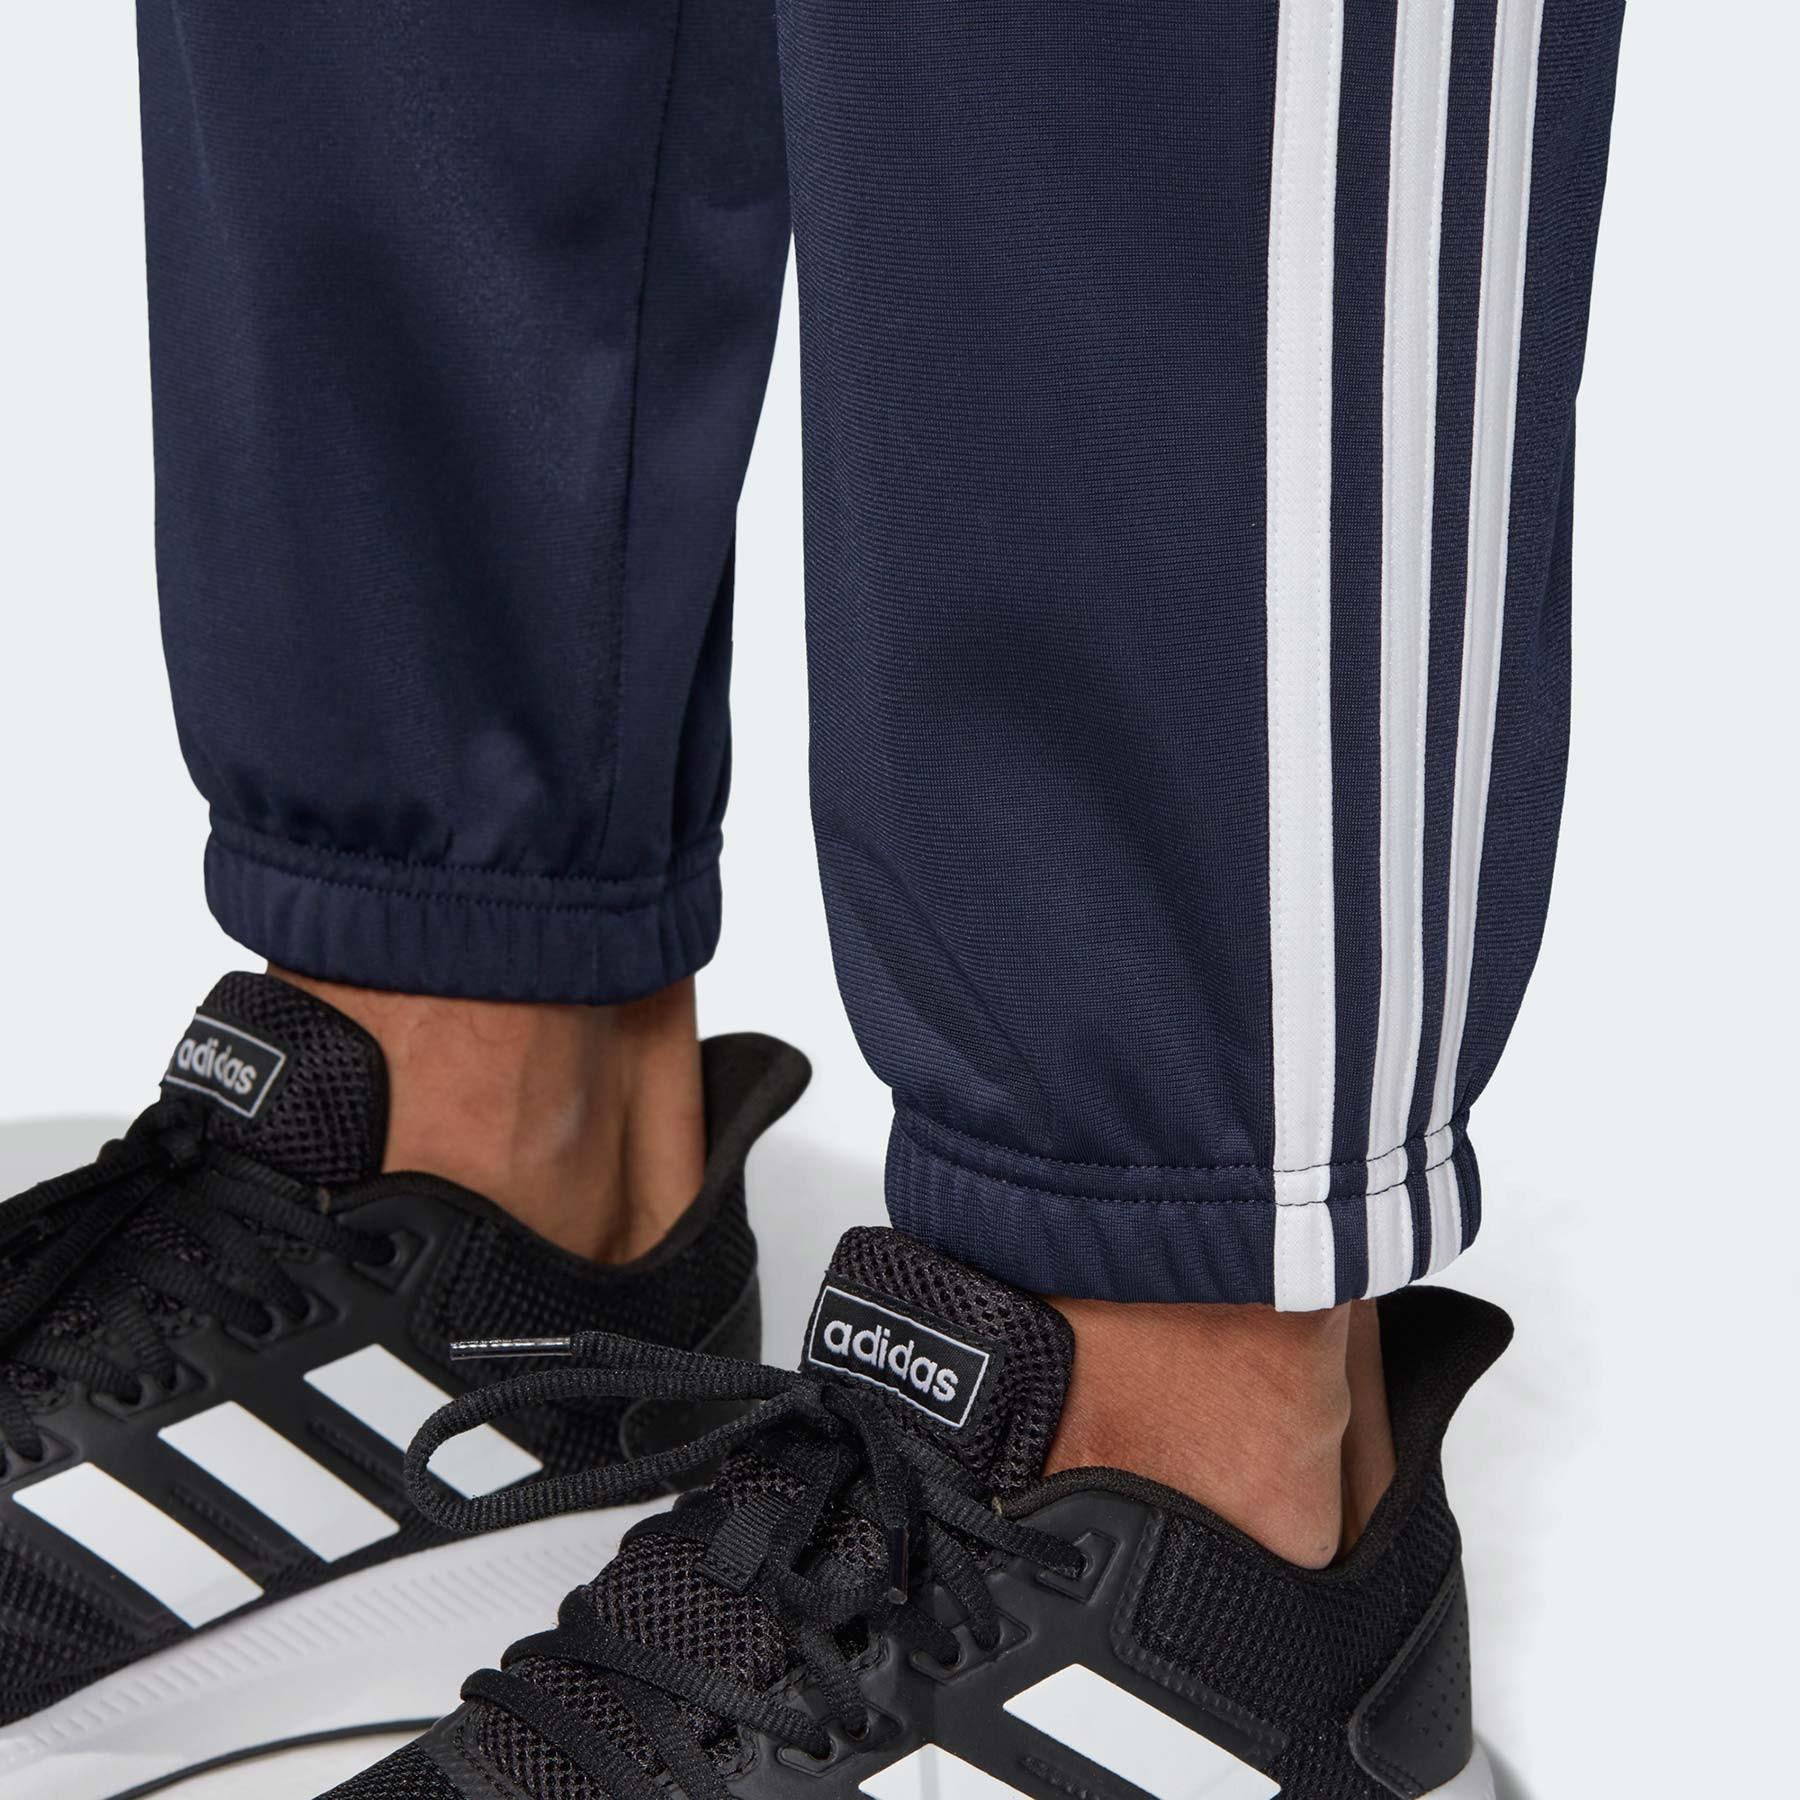 superficial portón Si  Adidas 3-Stripes Track Suit Κωδικός: DV2468 - Aethlon Sports